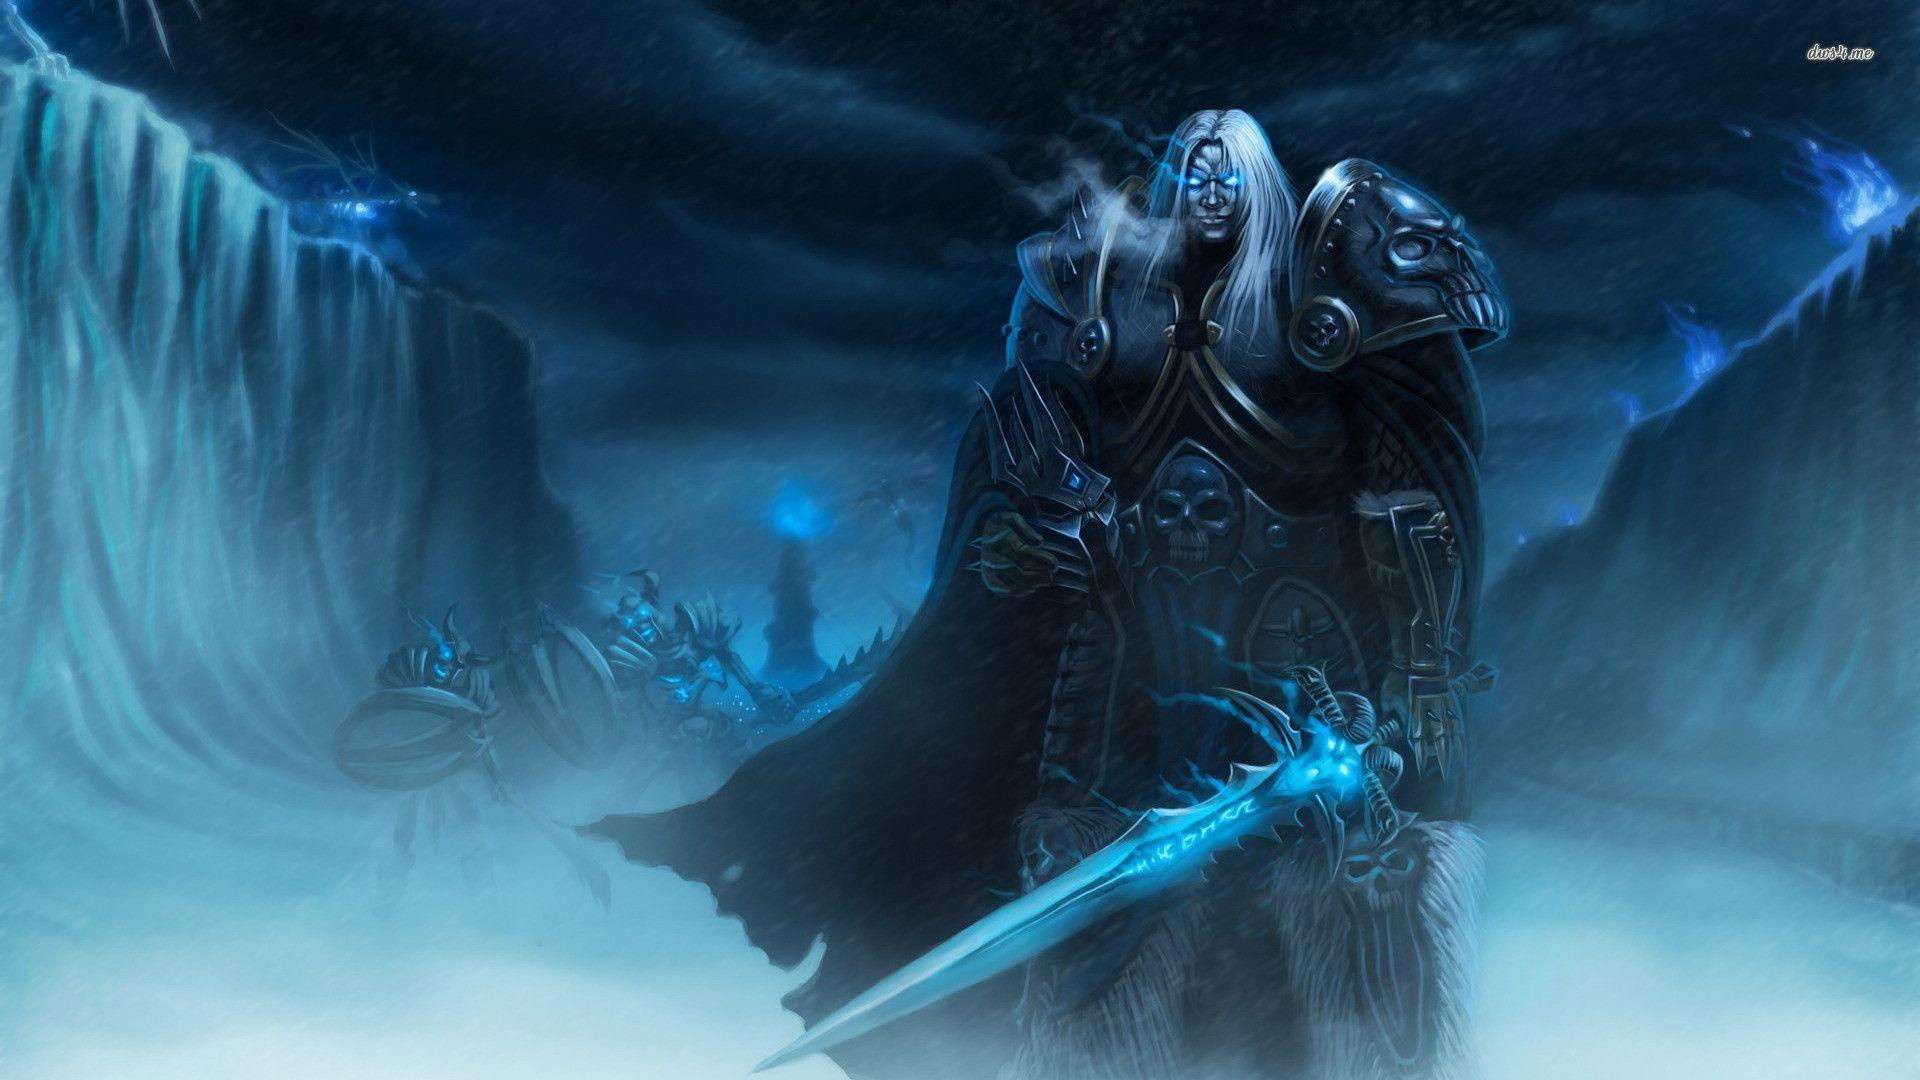 Arthas Menethil – World of Warcraft wallpaper 1920x1080 px ...